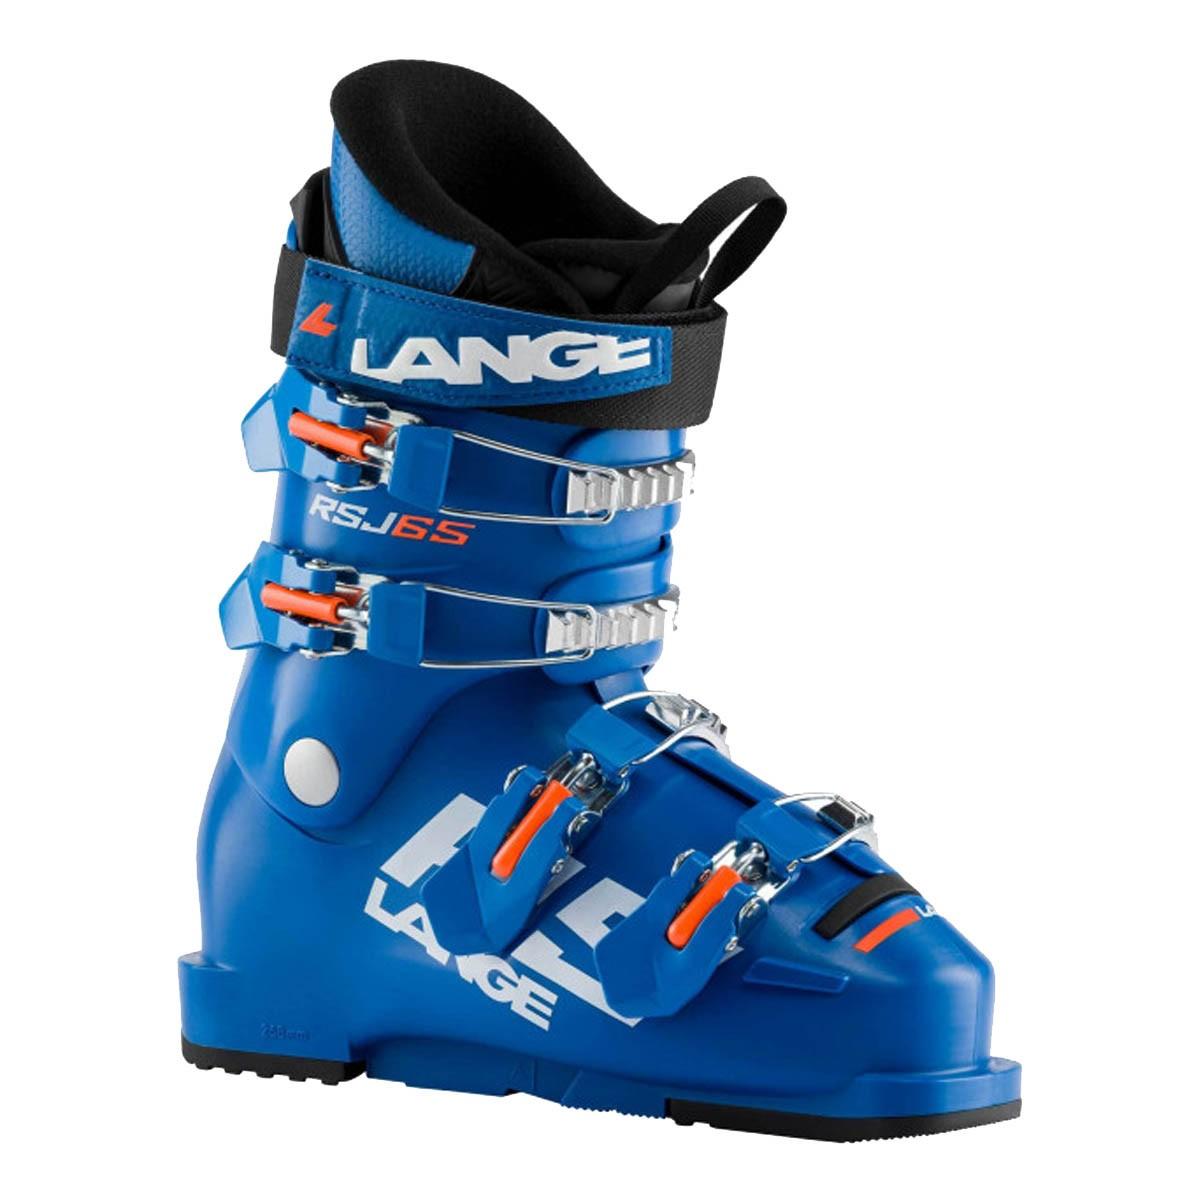 Scarponi Sci Lange Rsj 65 (Colore: power blue, Taglia: 20.5)